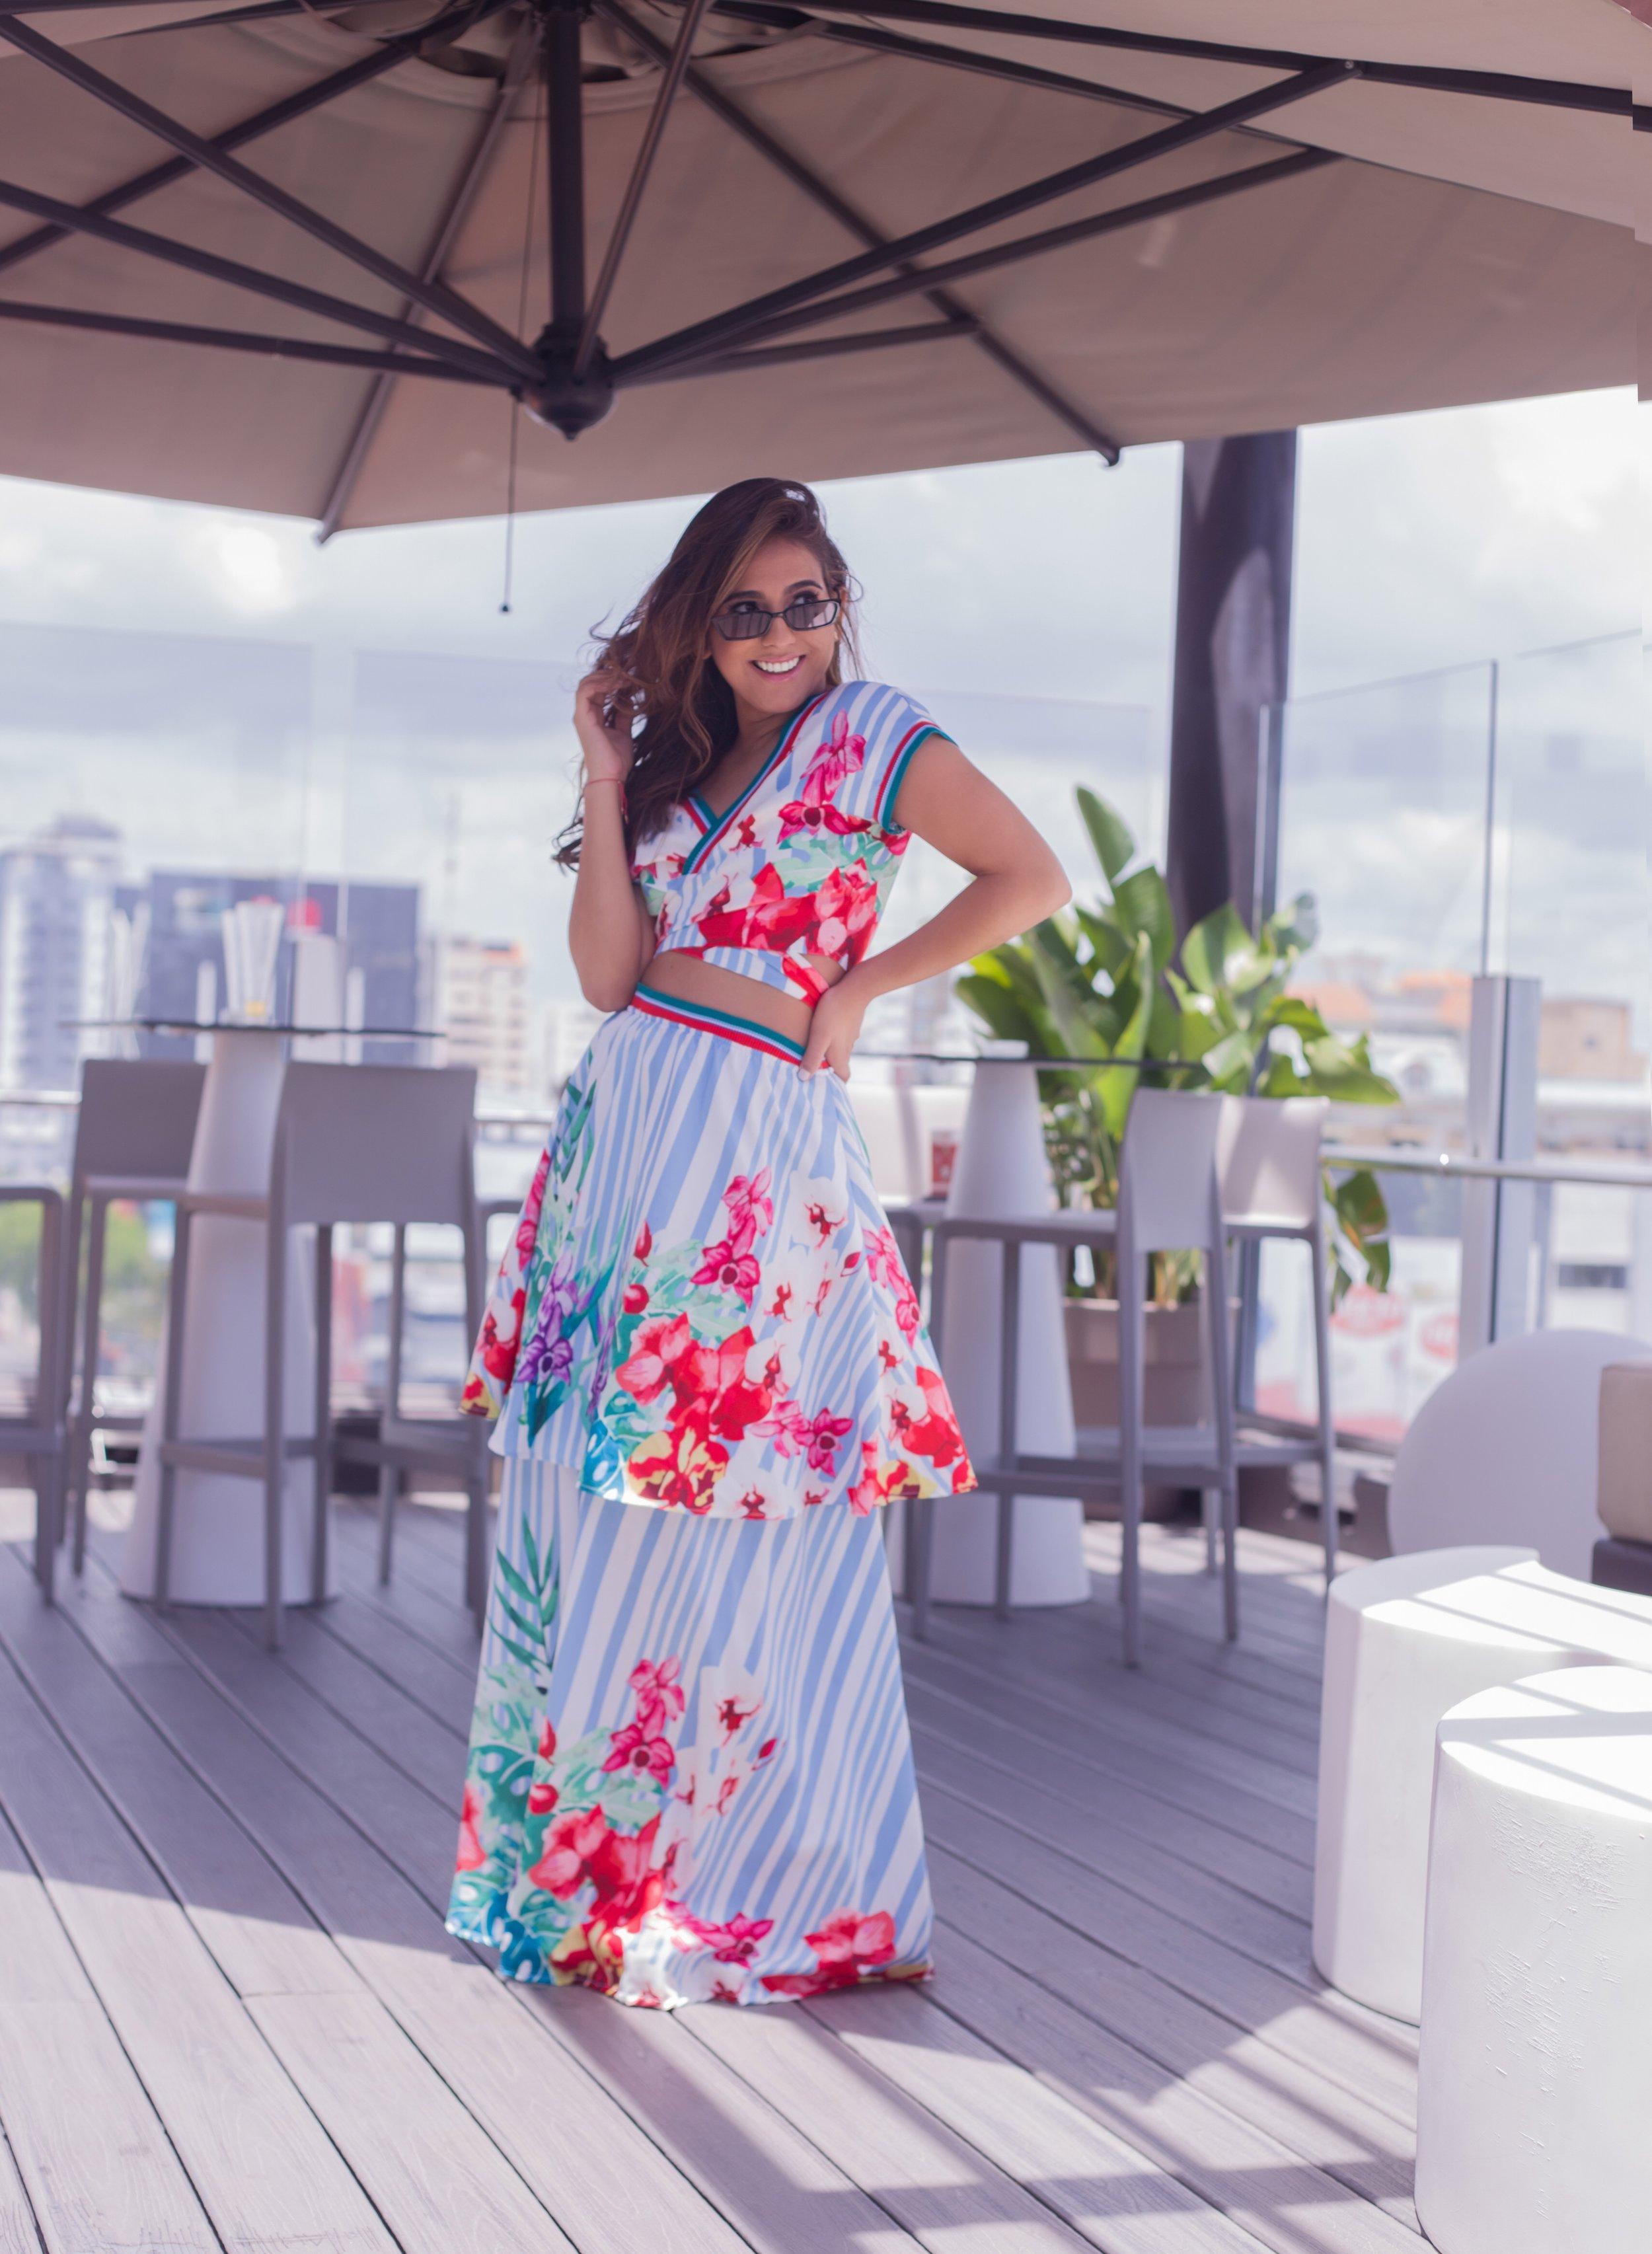 fashion blogger ideas spring break coolness inspiration paloma de la cruz